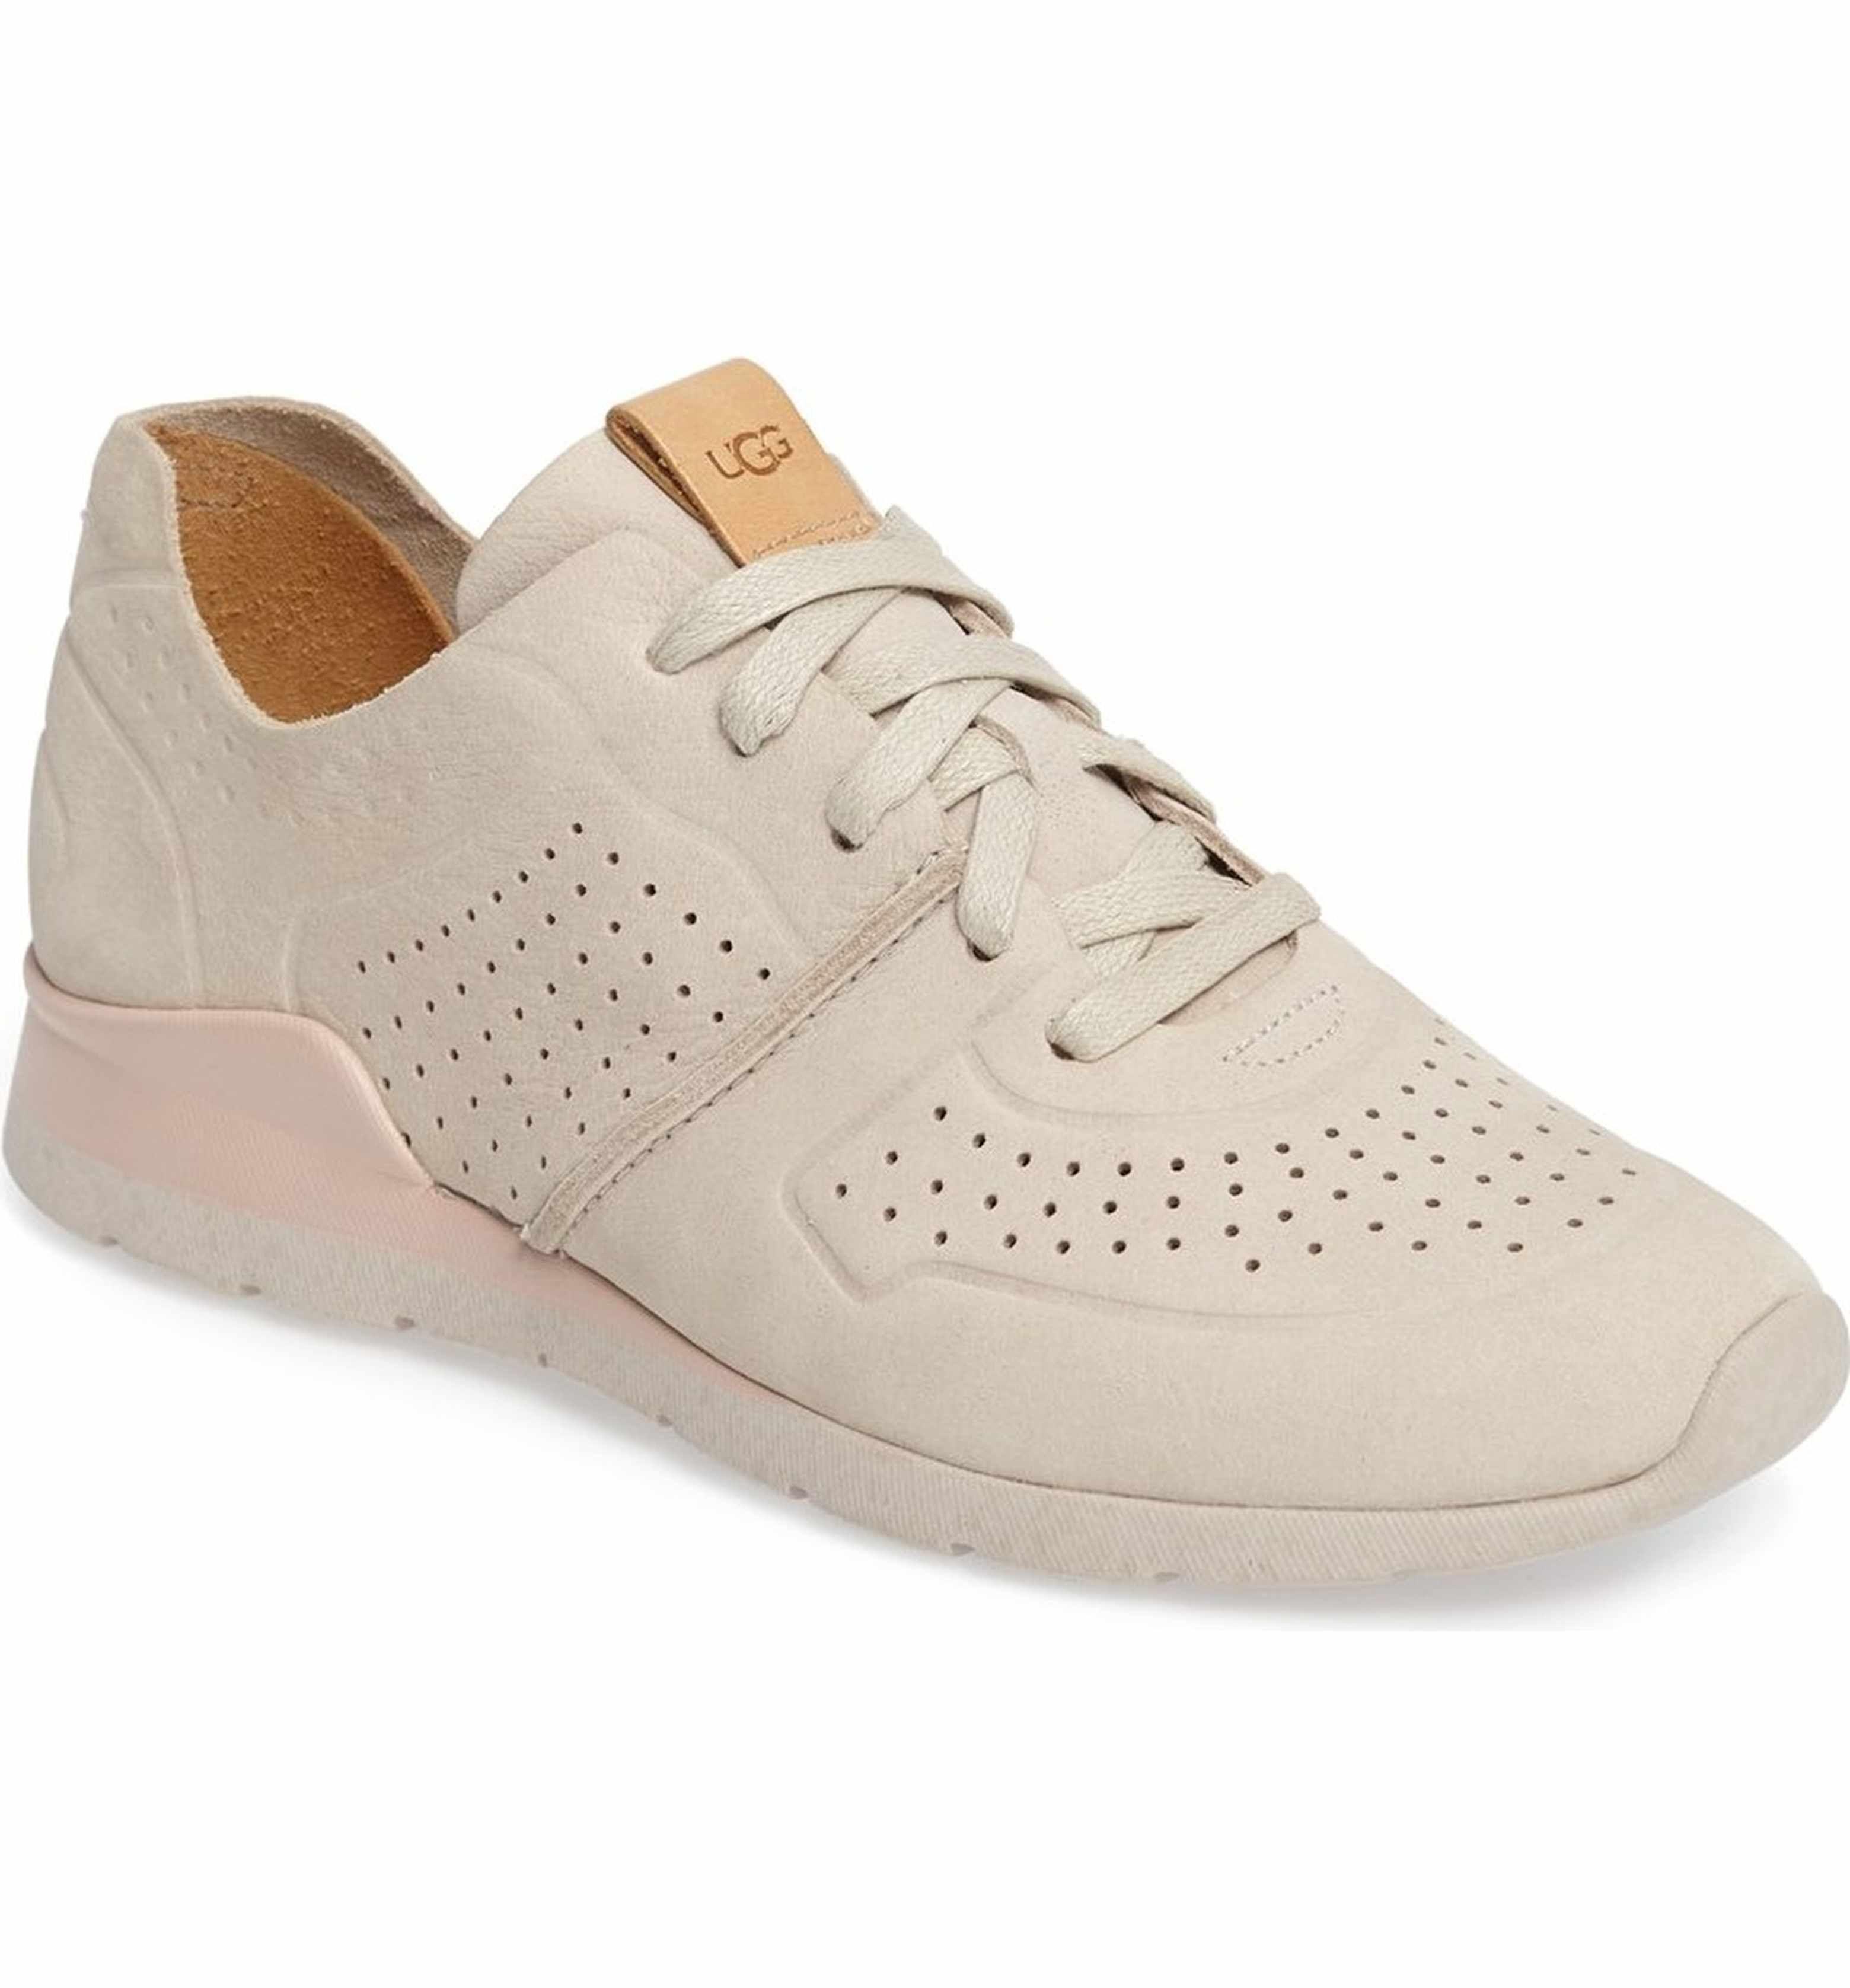 Main Image - UGG® Tye Sneaker (Women